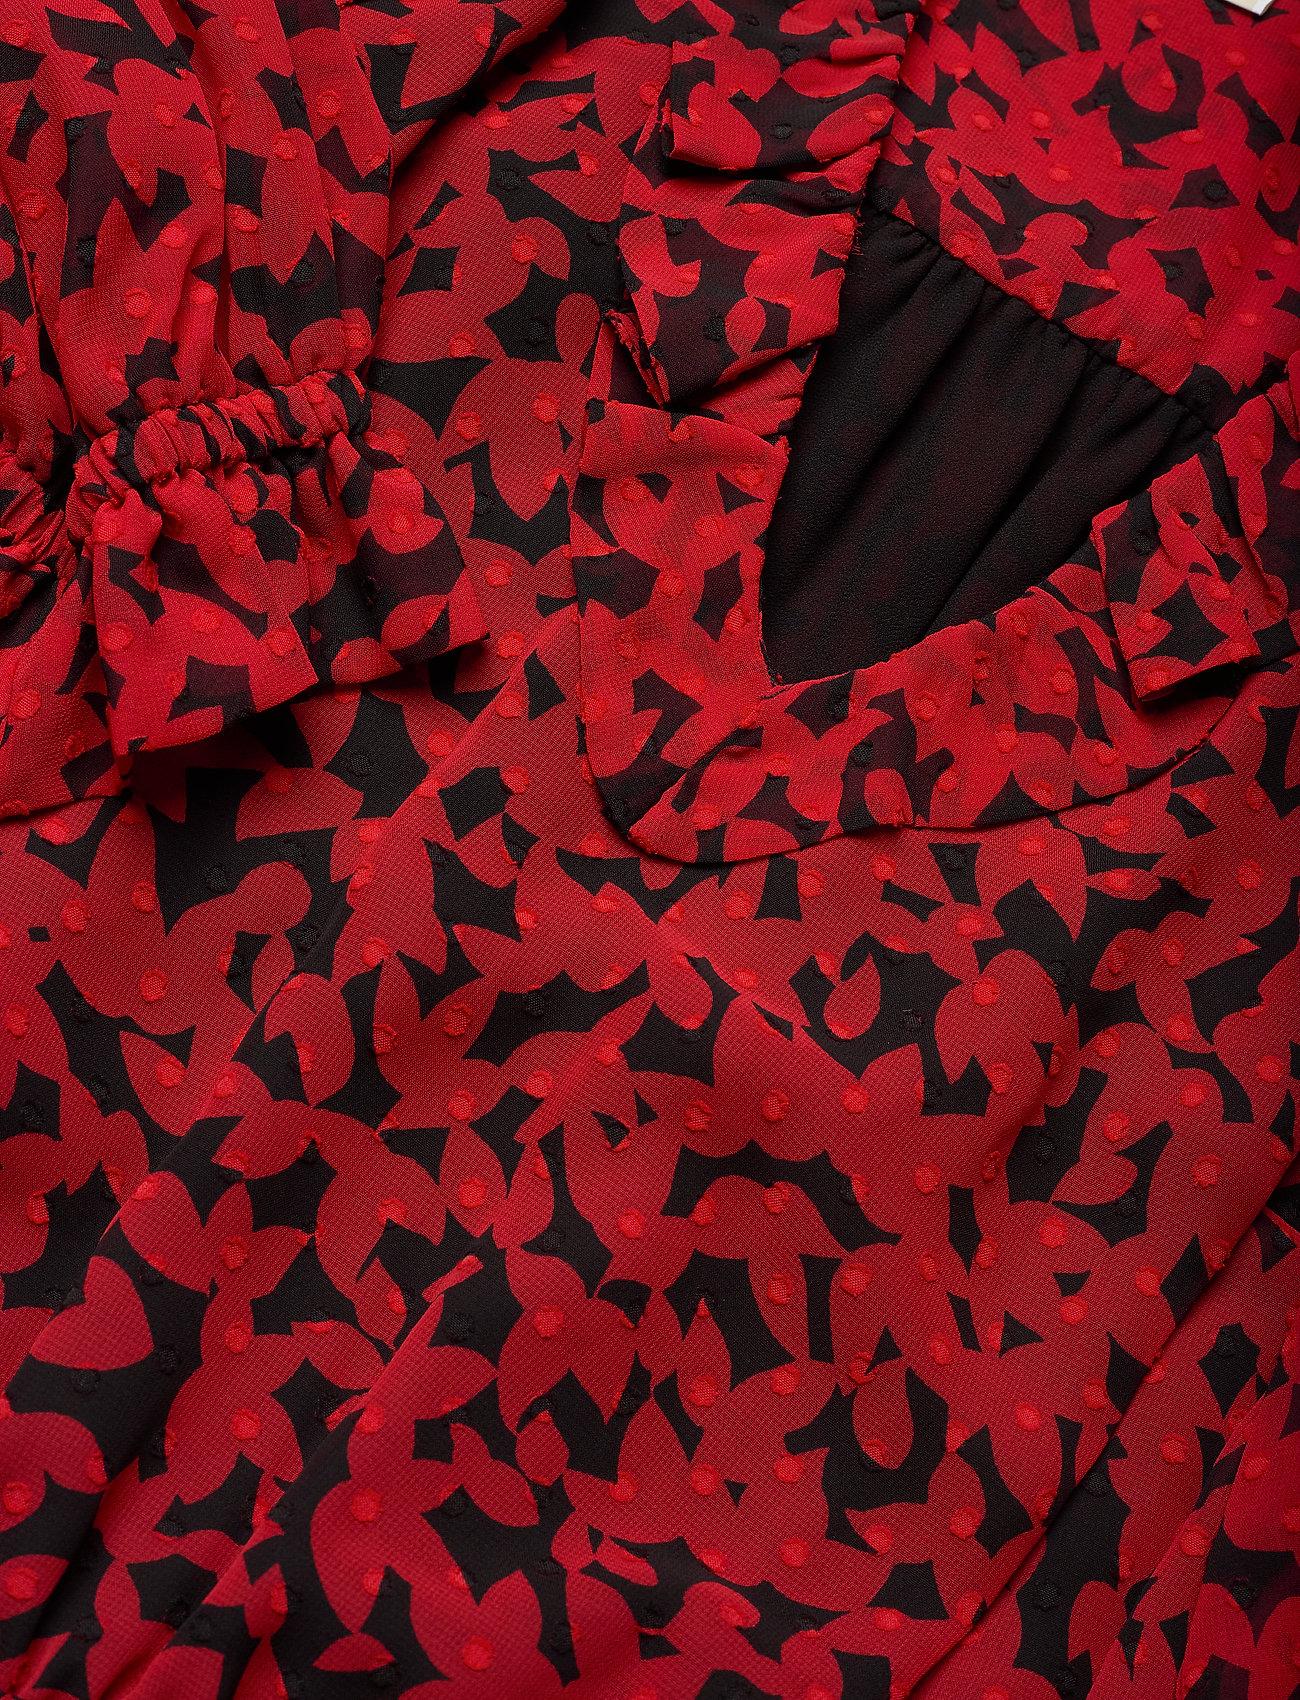 Kors Dressblck Leaf Tiered scarletMichael Gdn 8vmNn0wO